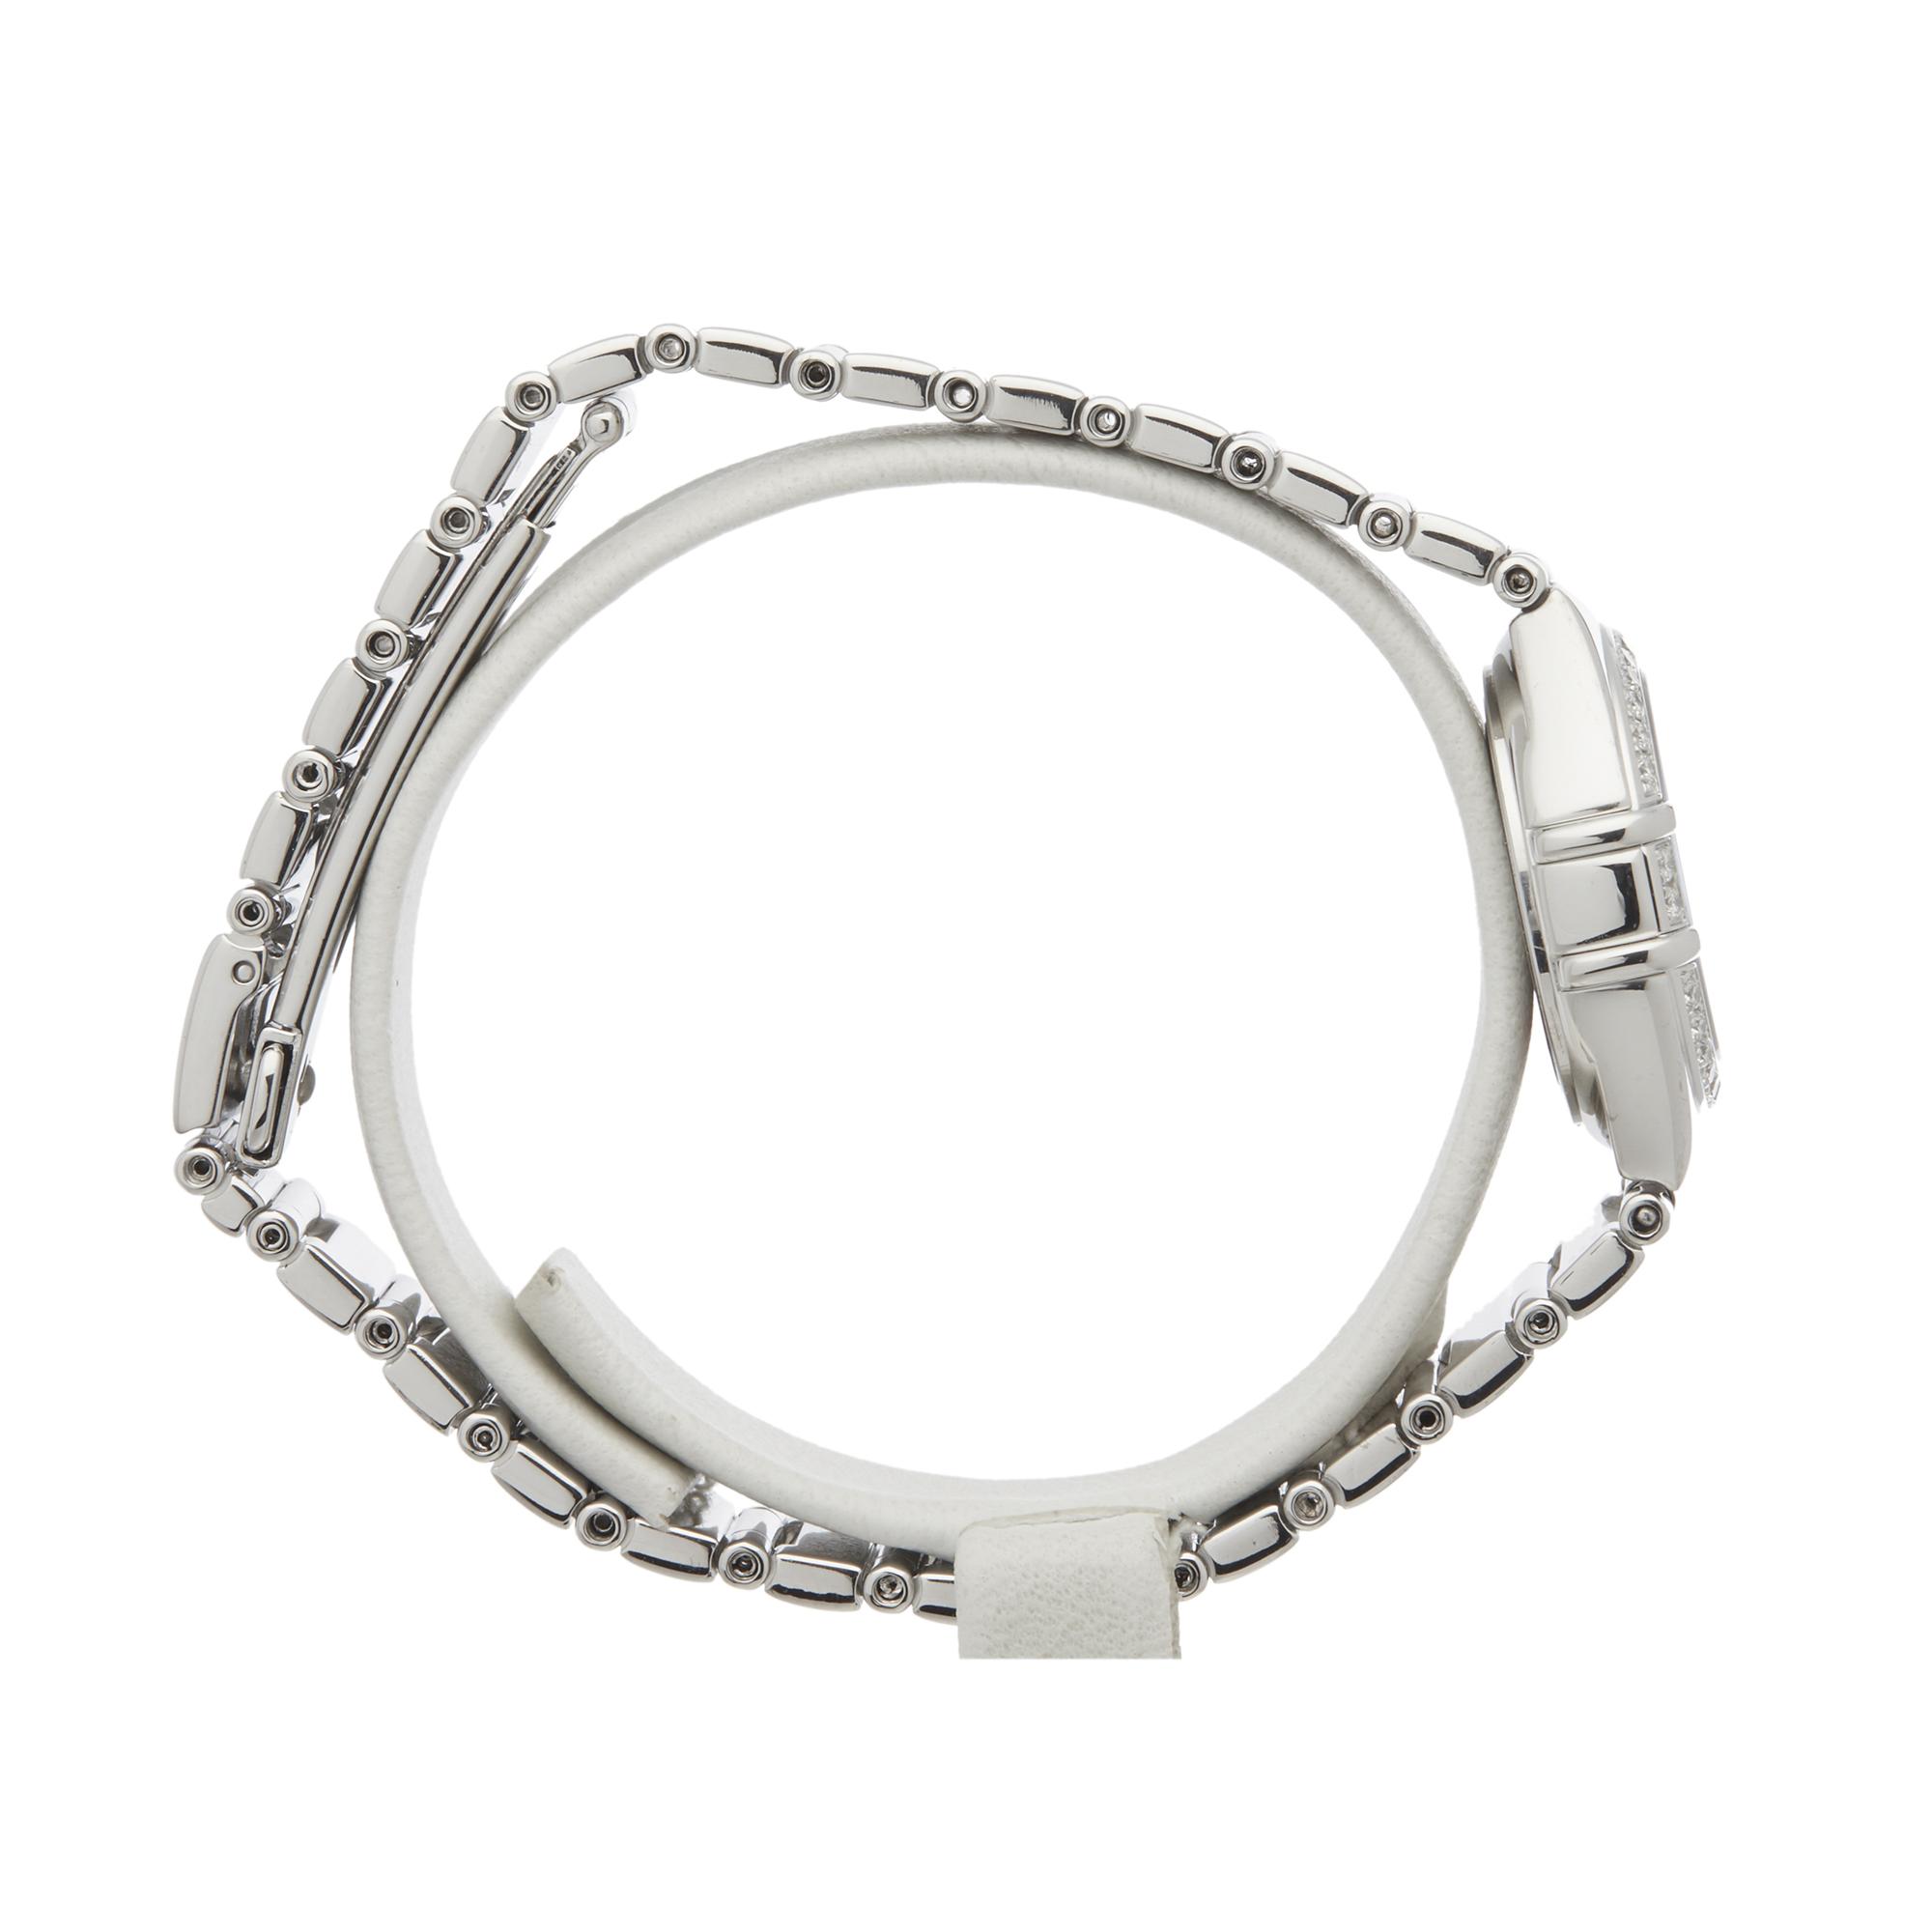 Omega Constellation 0 1165.36 Ladies White Gold Diamond Watch - Image 5 of 7